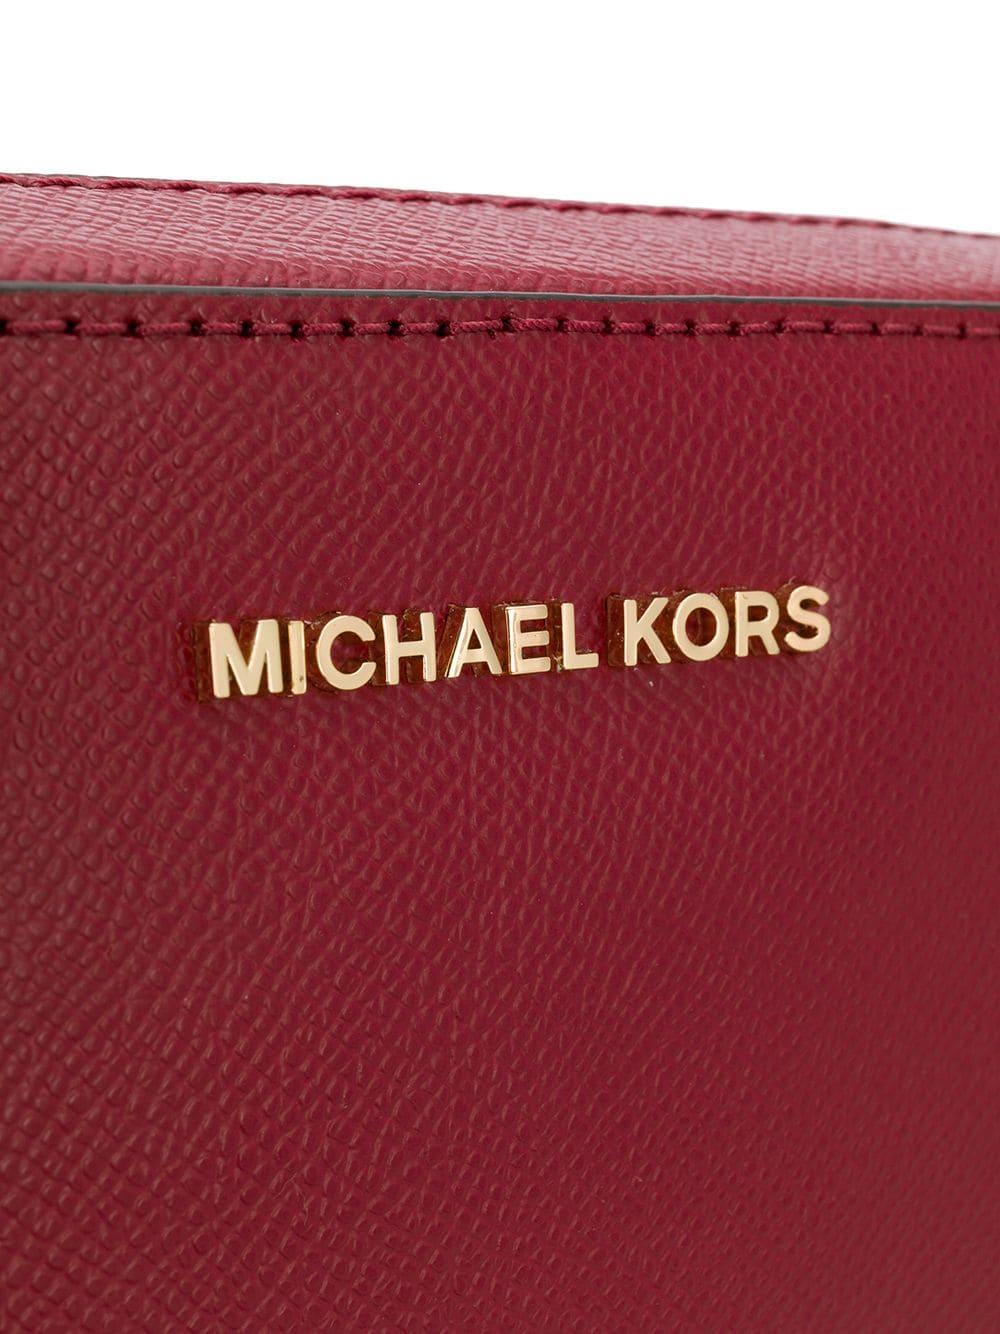 Bolsa Michael Kors Crossbodies Transversal East West Vinho - Vermelha